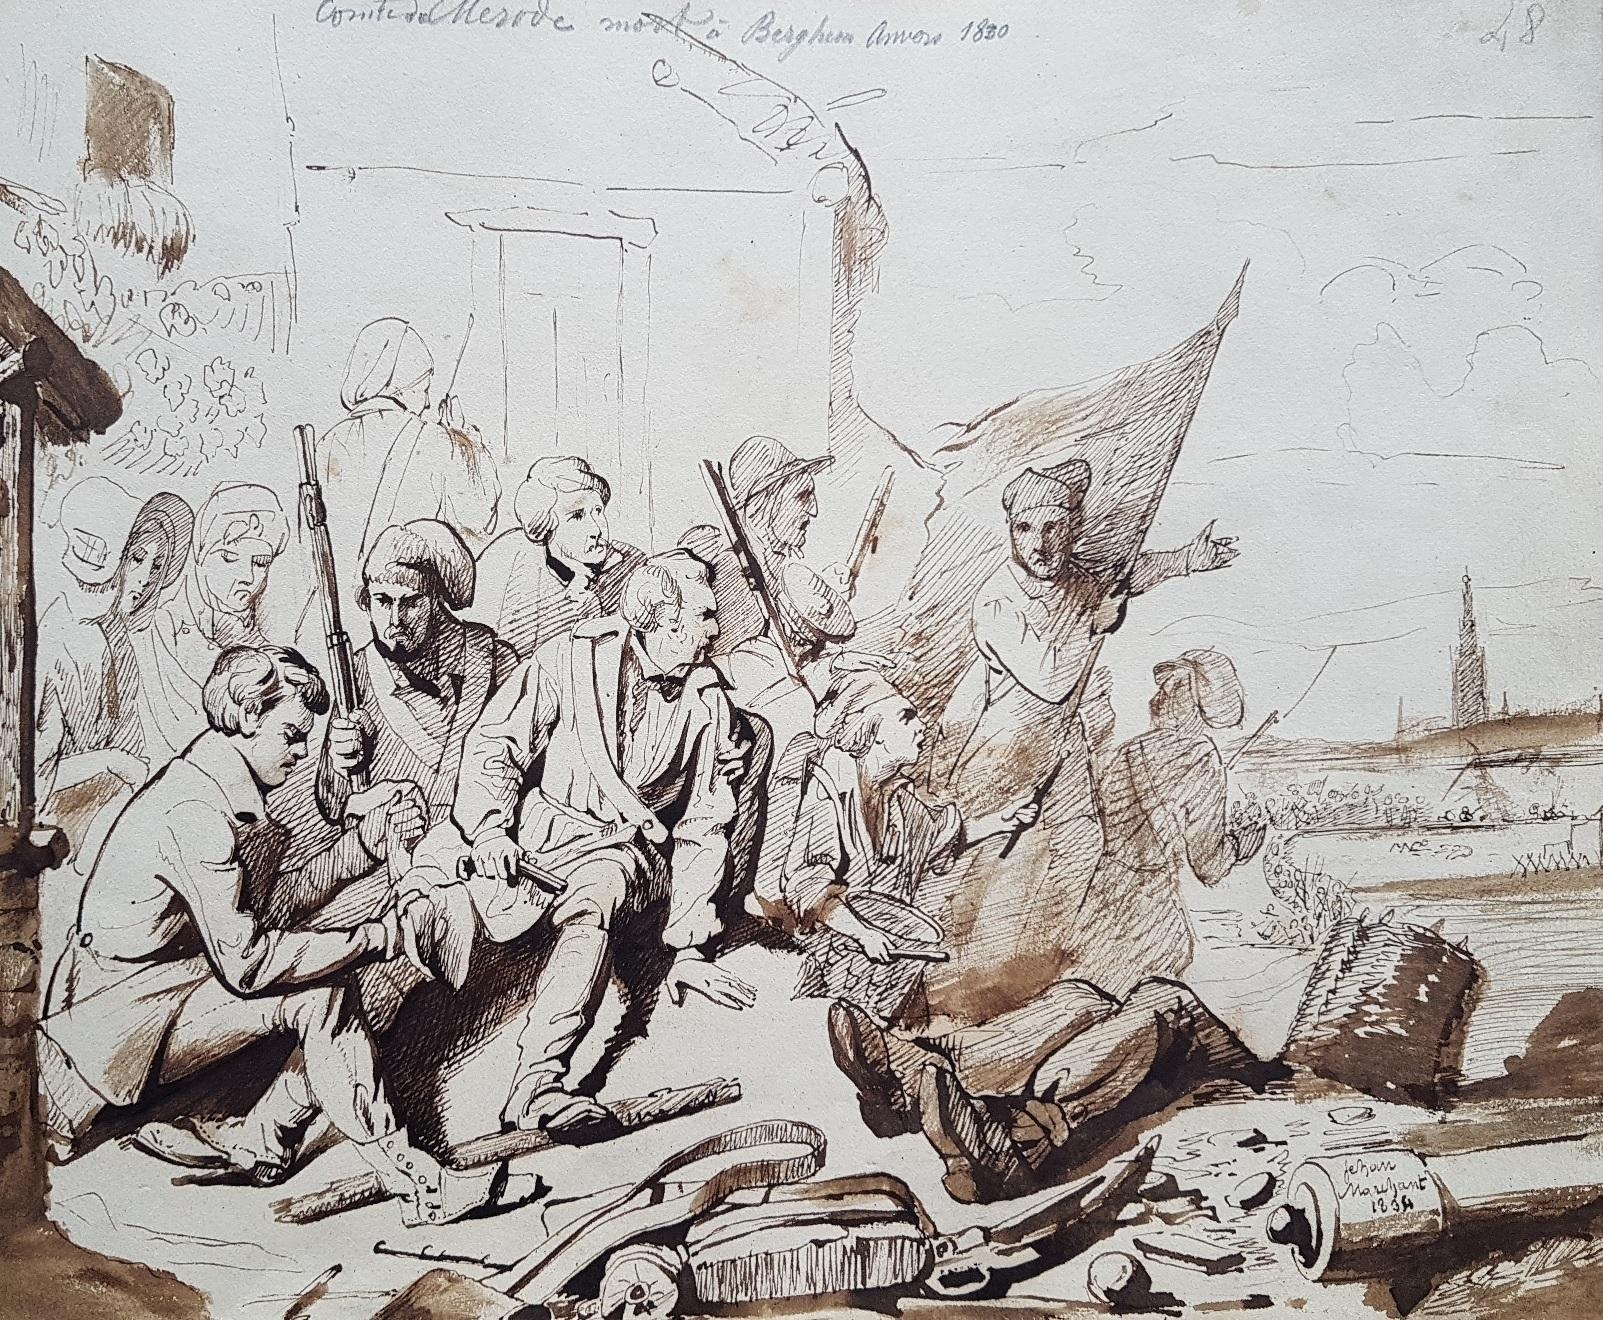 De slag bij Sint-Agatha-Berchem op 24 oktober 1830